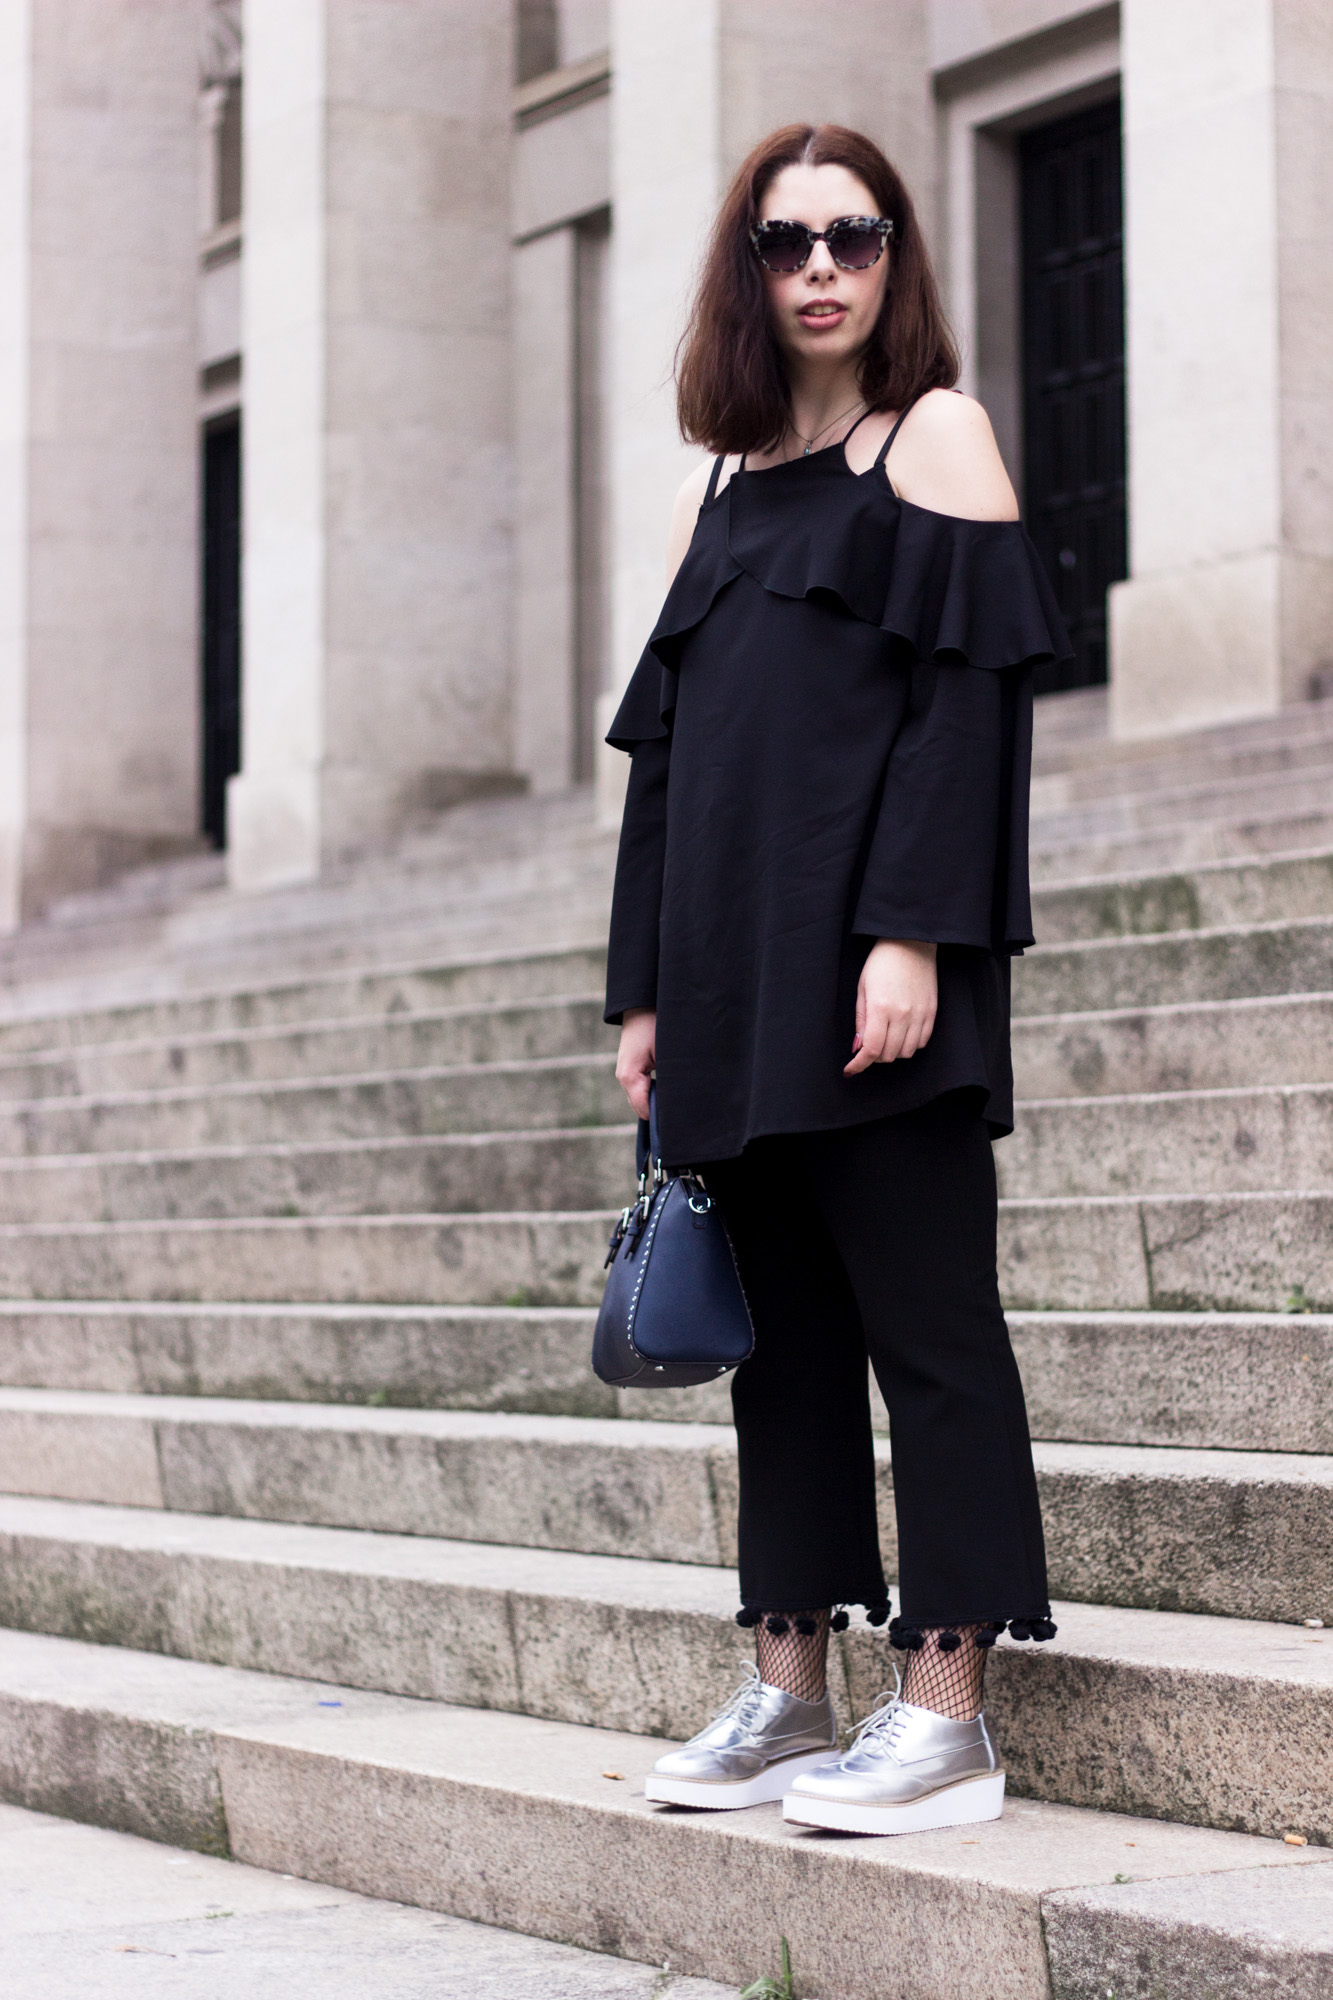 outfit-looks-black-zara-michael-kors